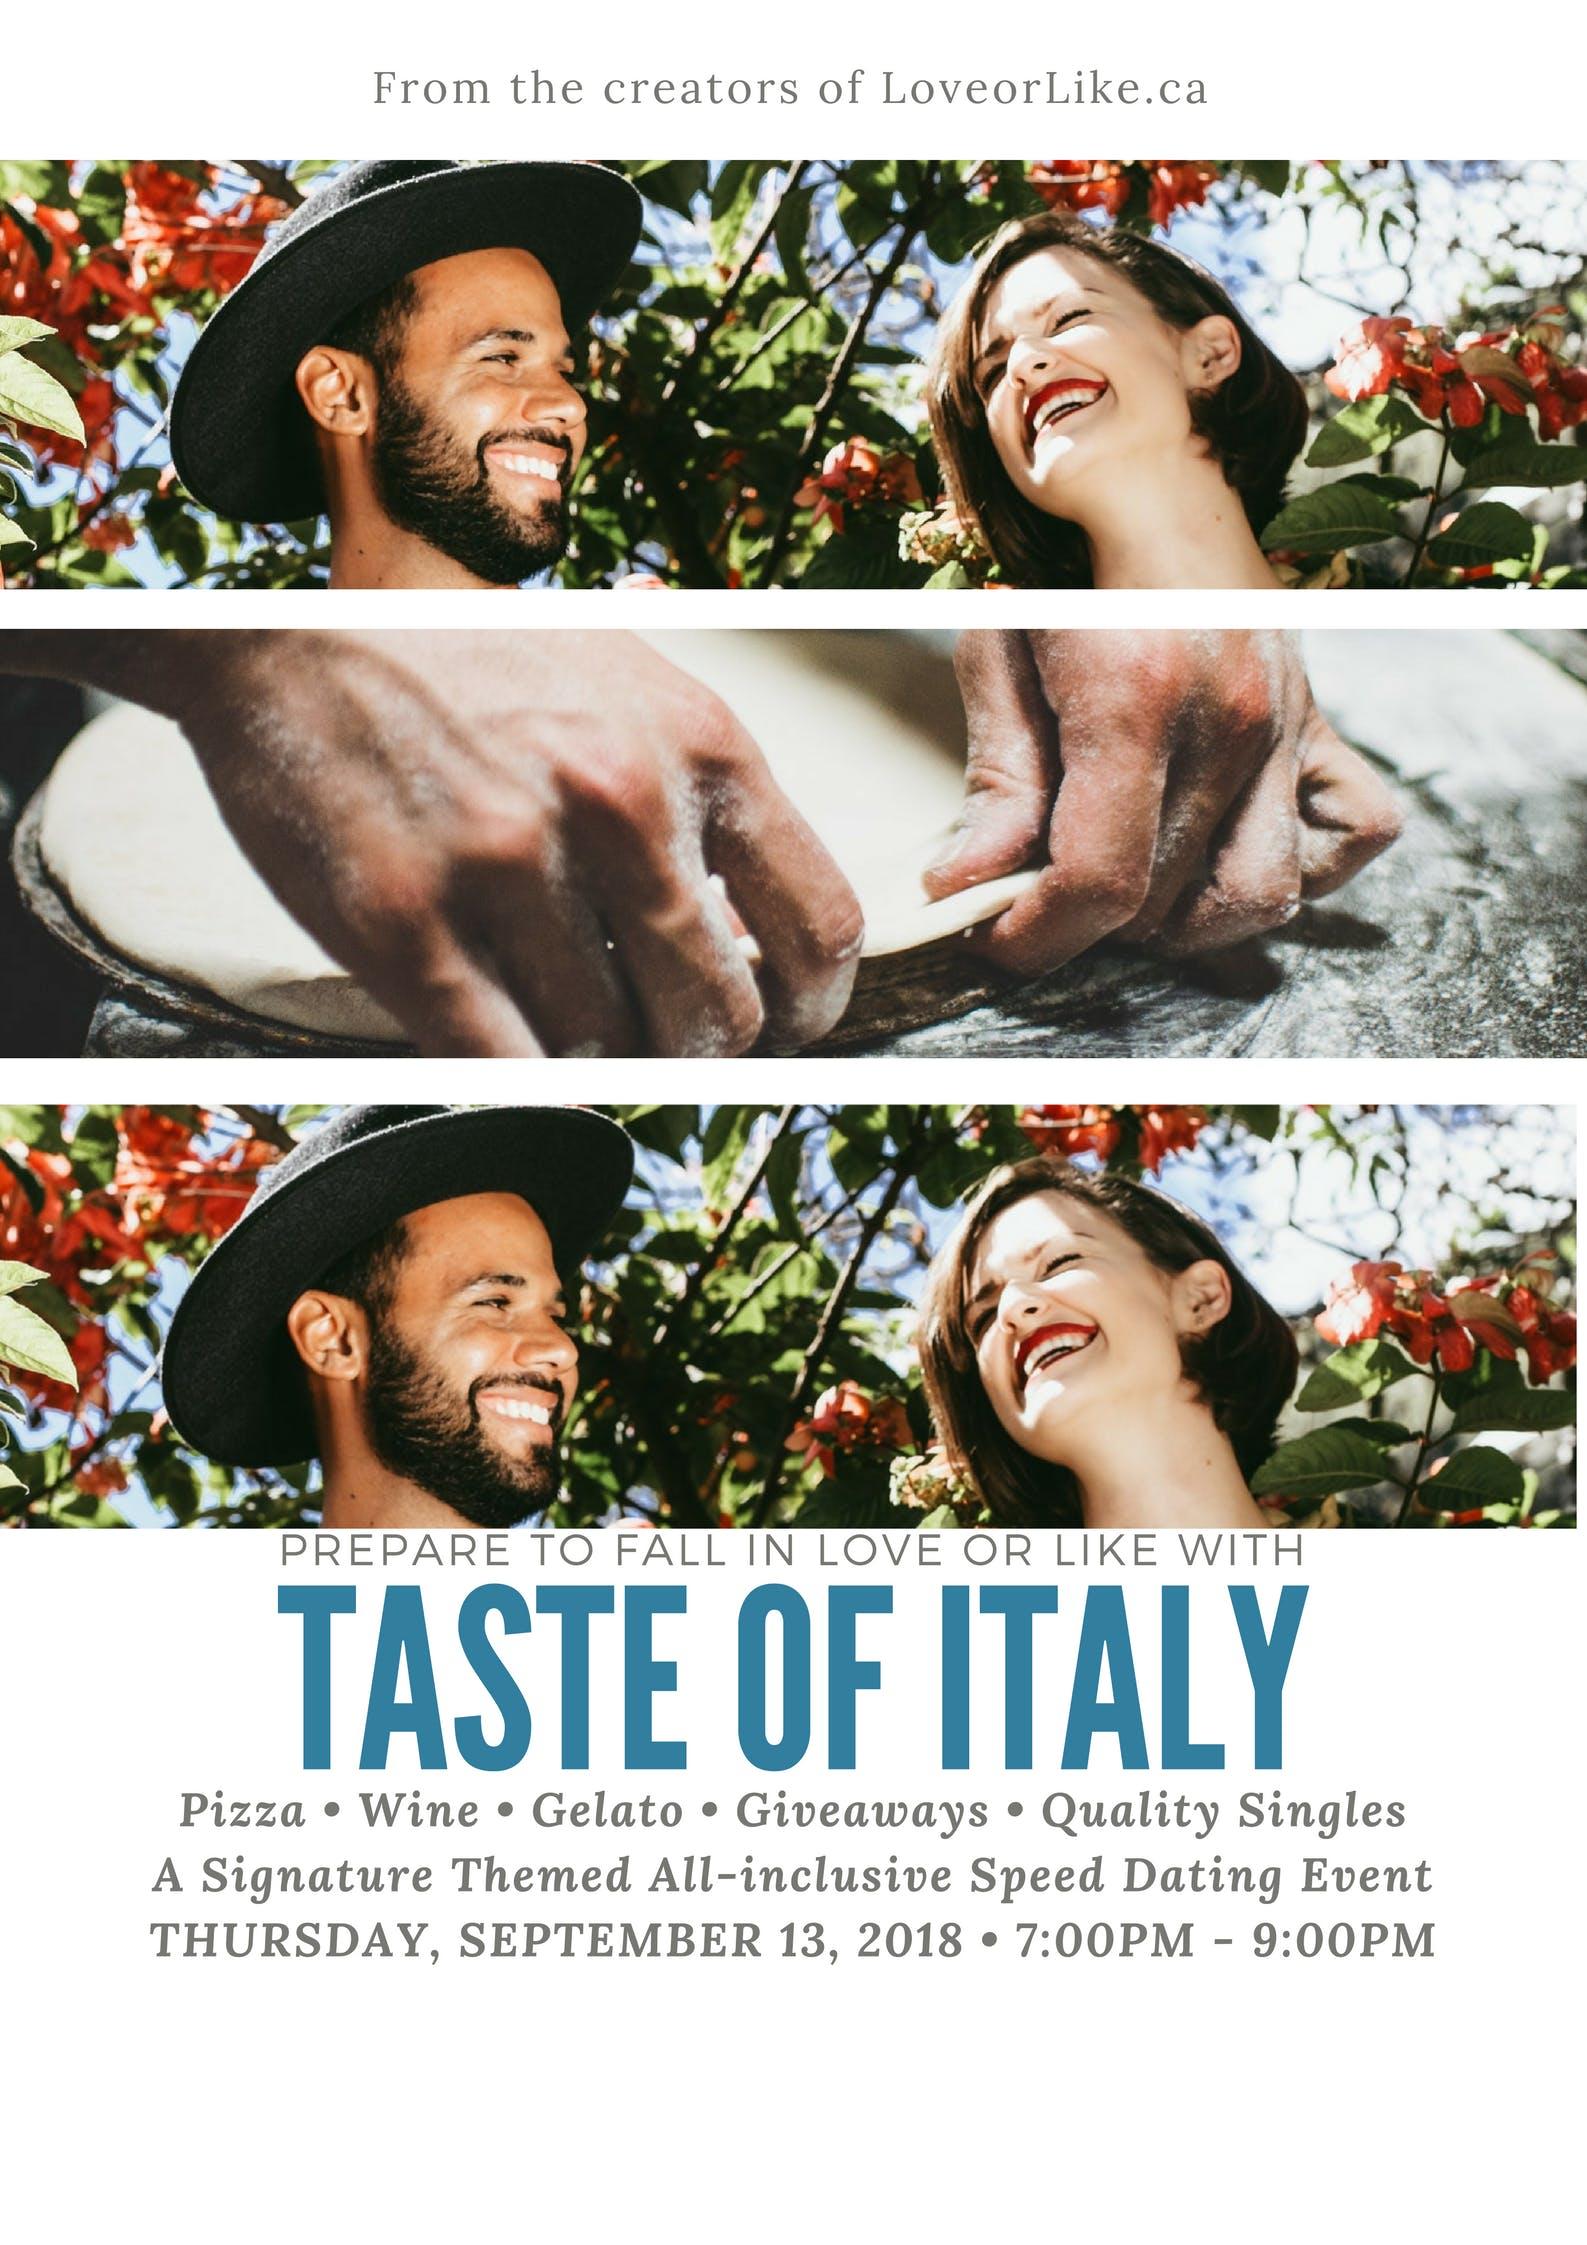 TORONTO SINGLES SPEED DATING - Mature Singles 40-50 - Taste of Italy theme ENCORE!  *Light Screening